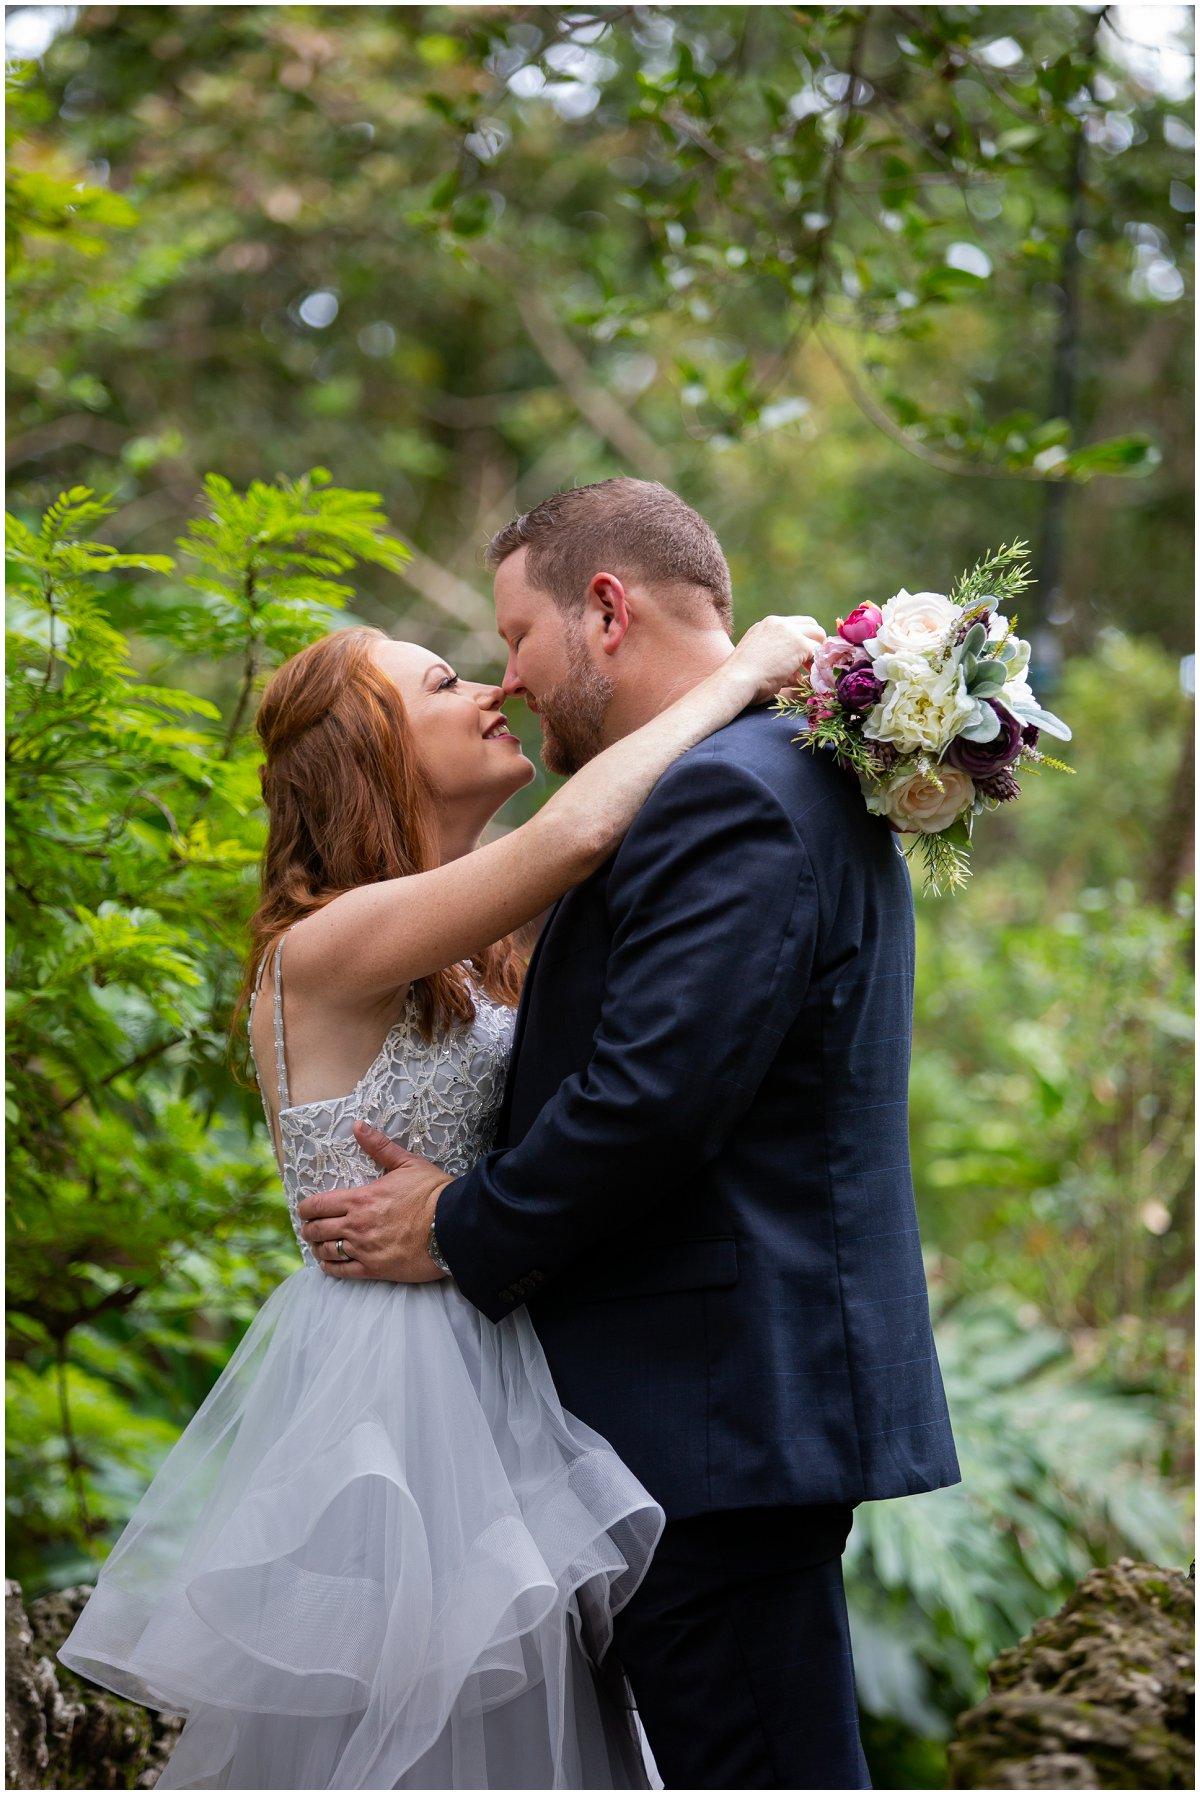 Tavares-wedding-photographer.jpg